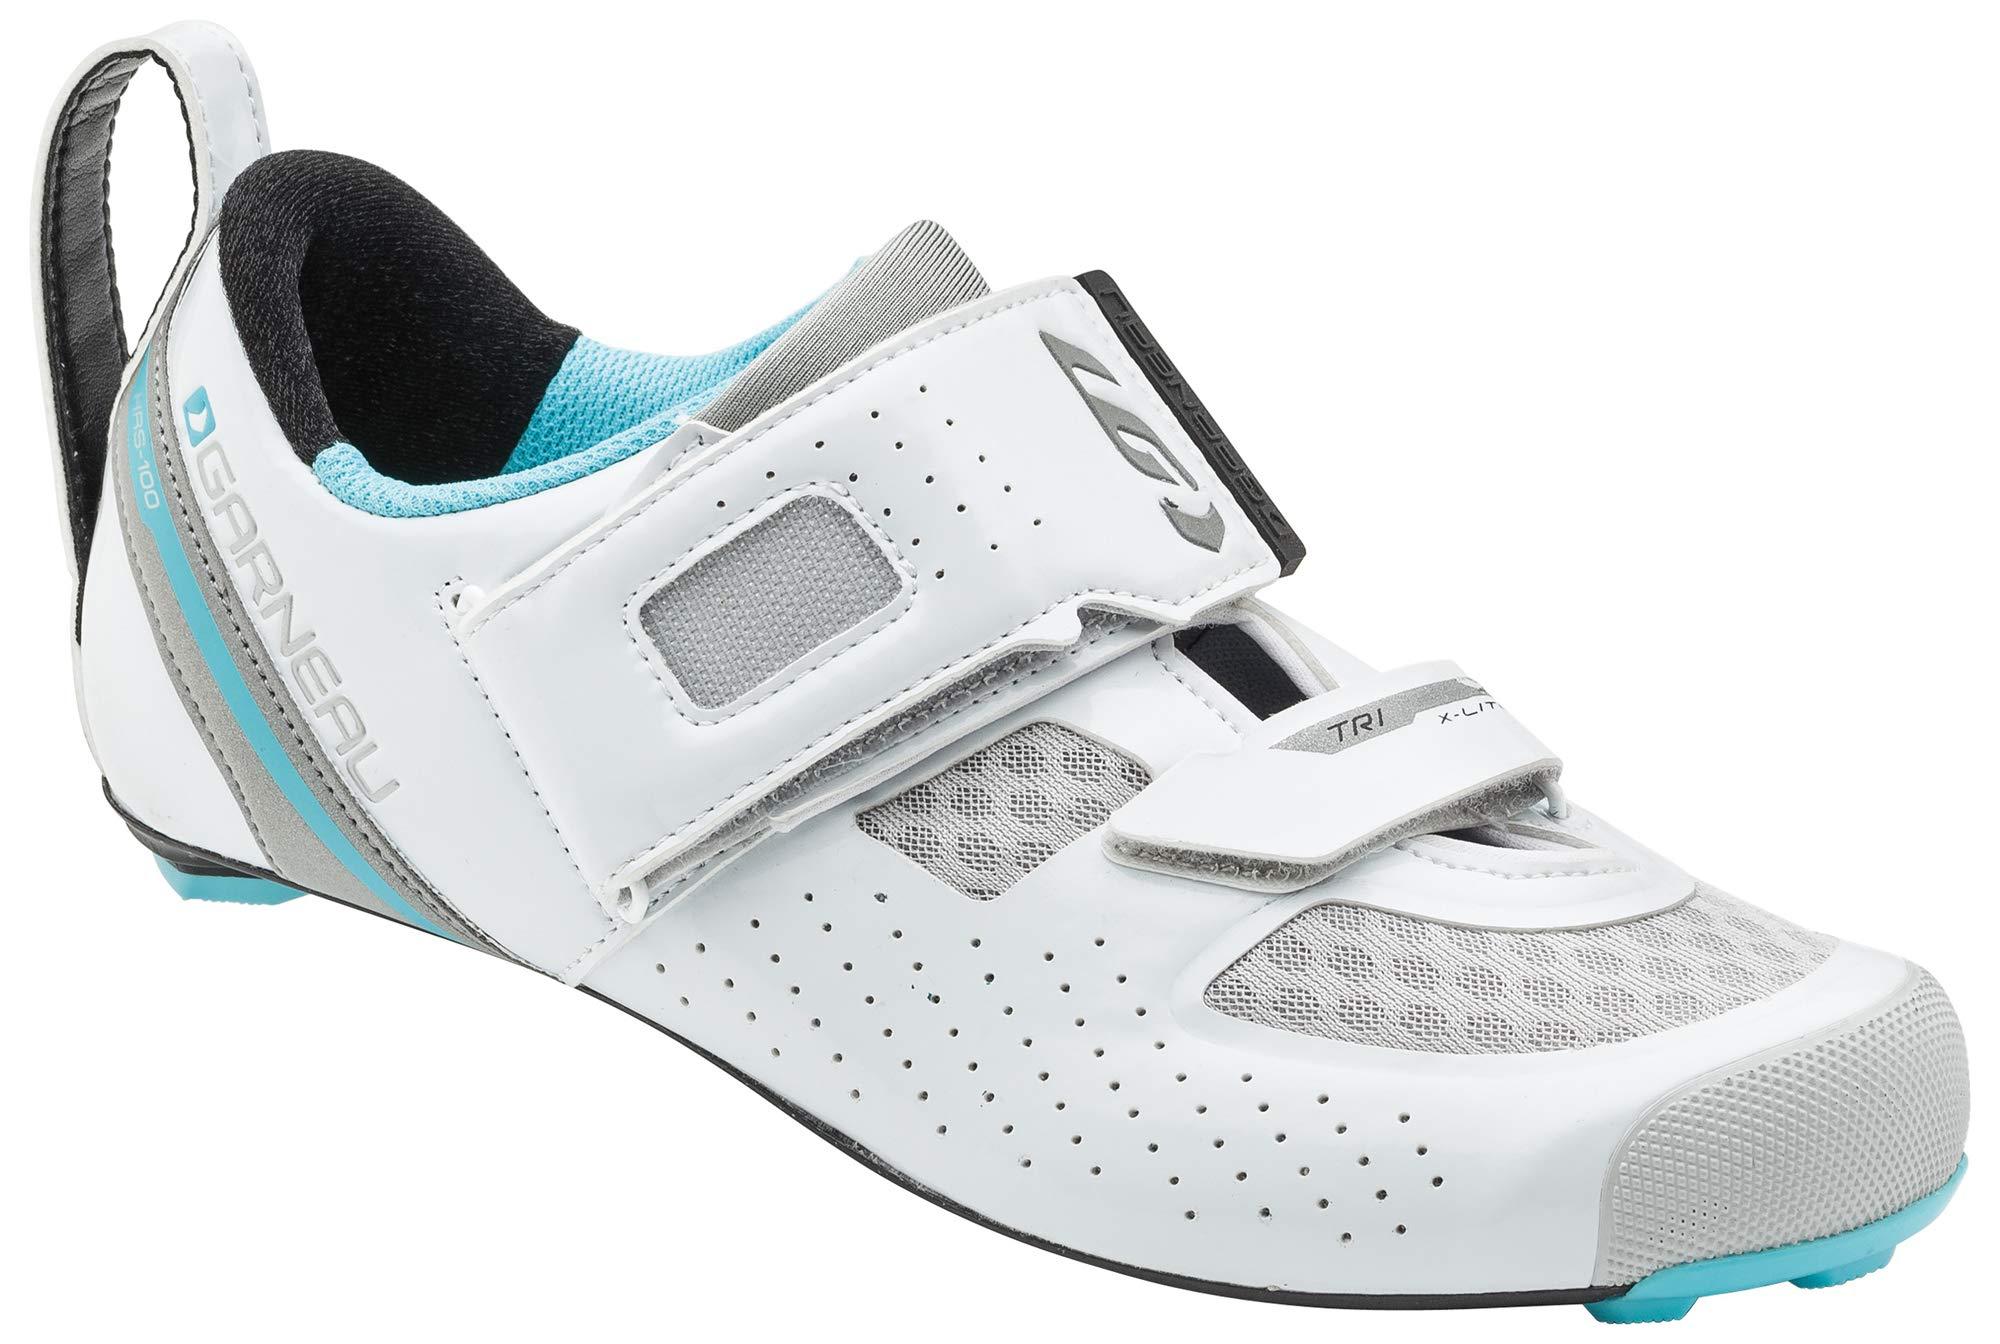 Louis Garneau Women's Tri X-Lite 2 Lightweight Triathlon Transition Bike Shoes, White/Blue Fish, US (6.5), EU (37) by Louis Garneau